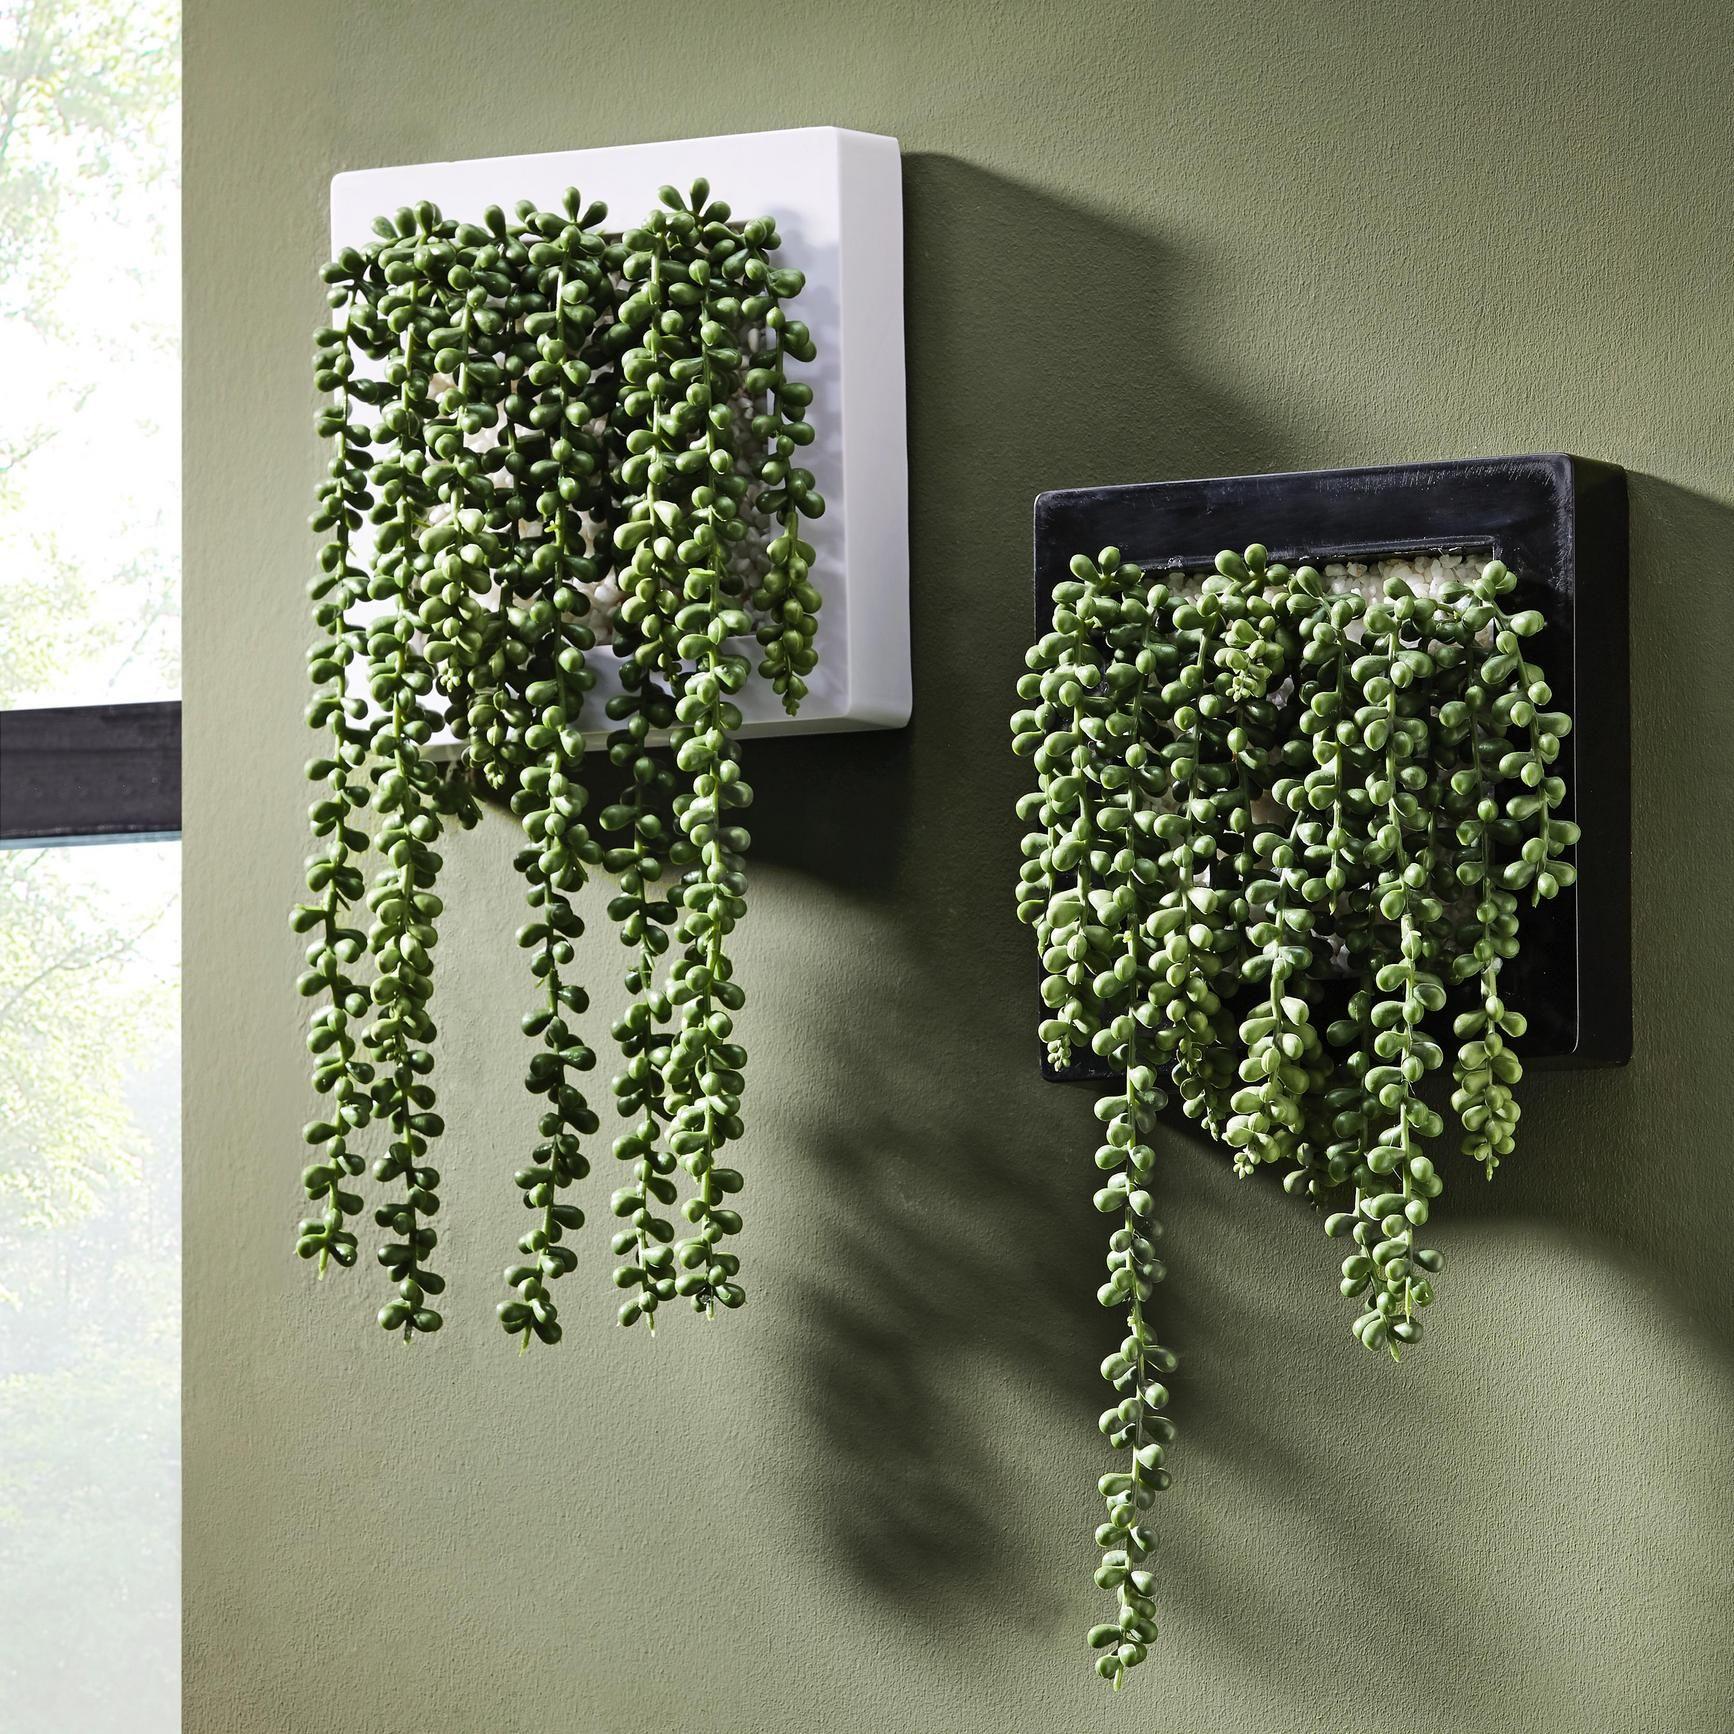 wanddeko hannah grun online kaufen momax dekoration home affaire wanddekoration modern